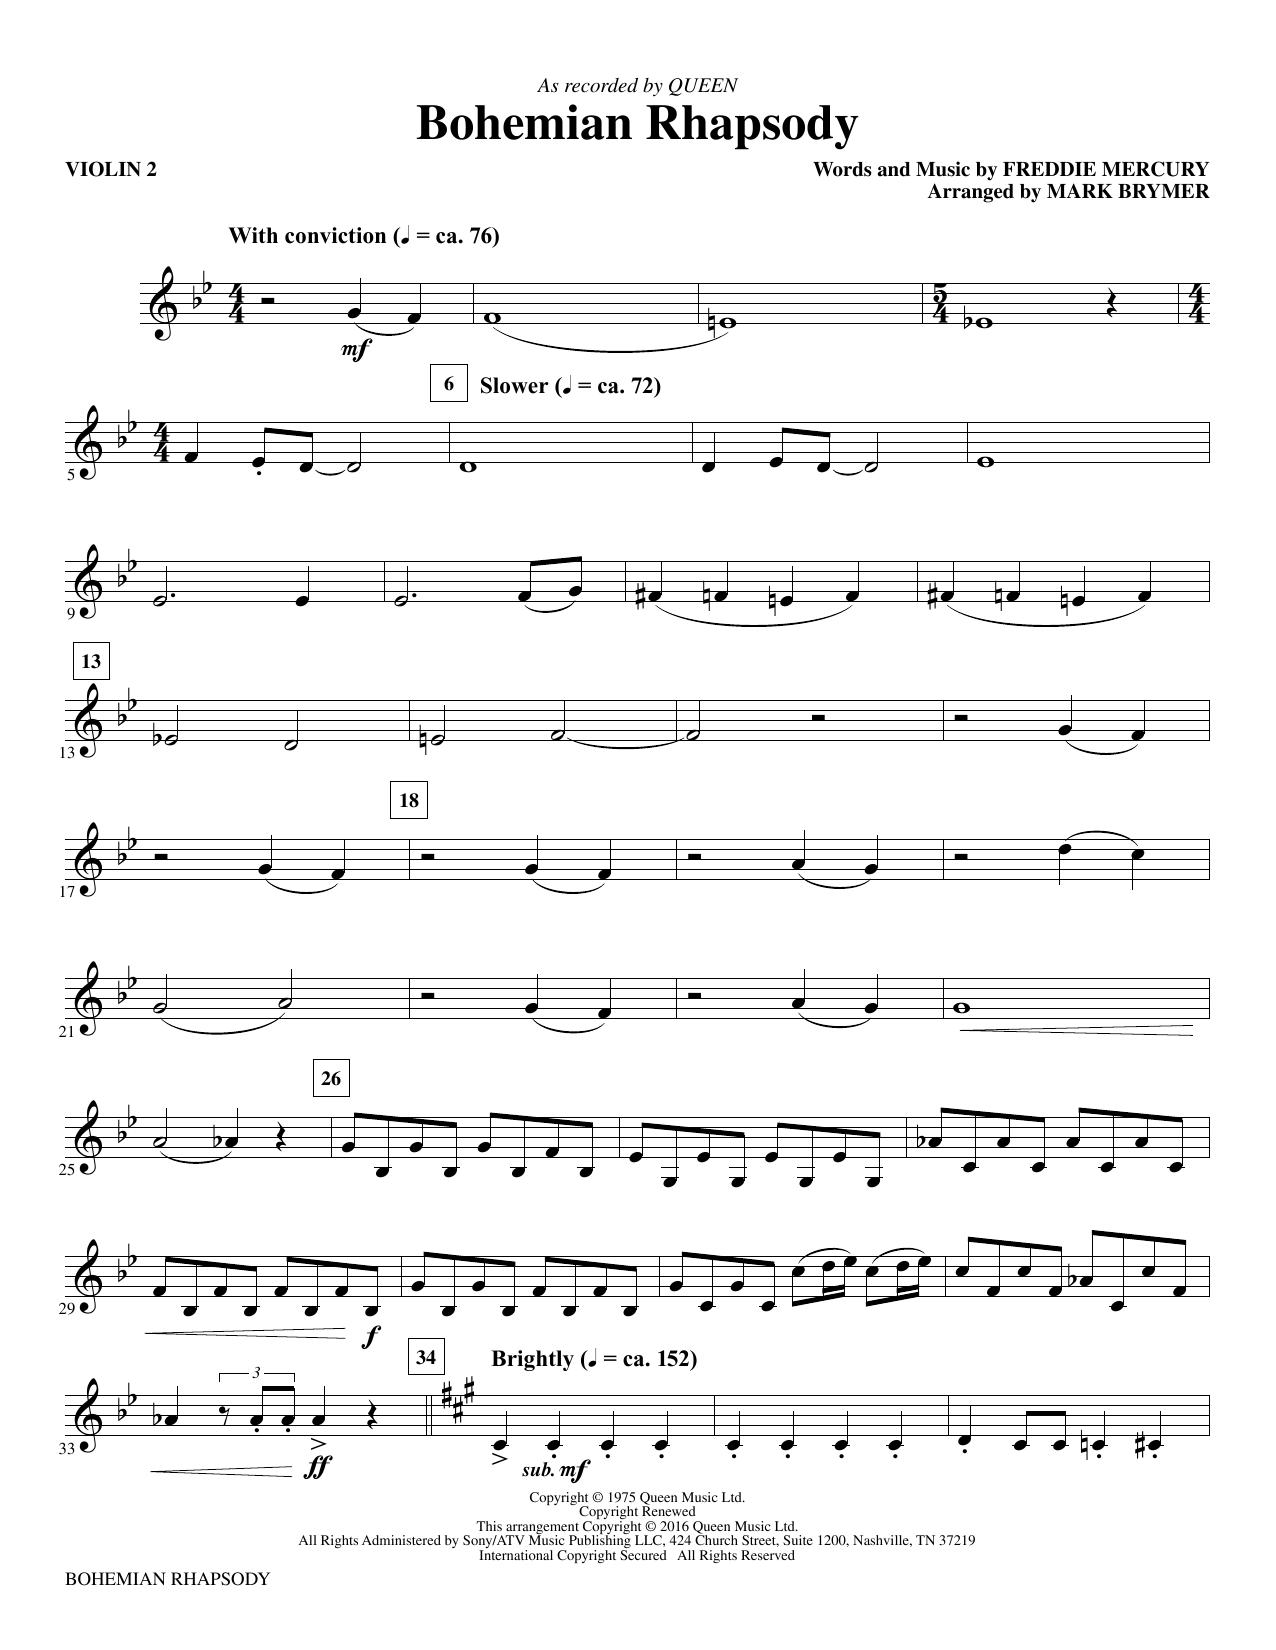 Queen 'Bohemian Rhapsody (arr  Mark Brymer) - Violin 2' Sheet Music Notes,  Chords | Download Printable Choir Instrumental Pak - SKU: 357181